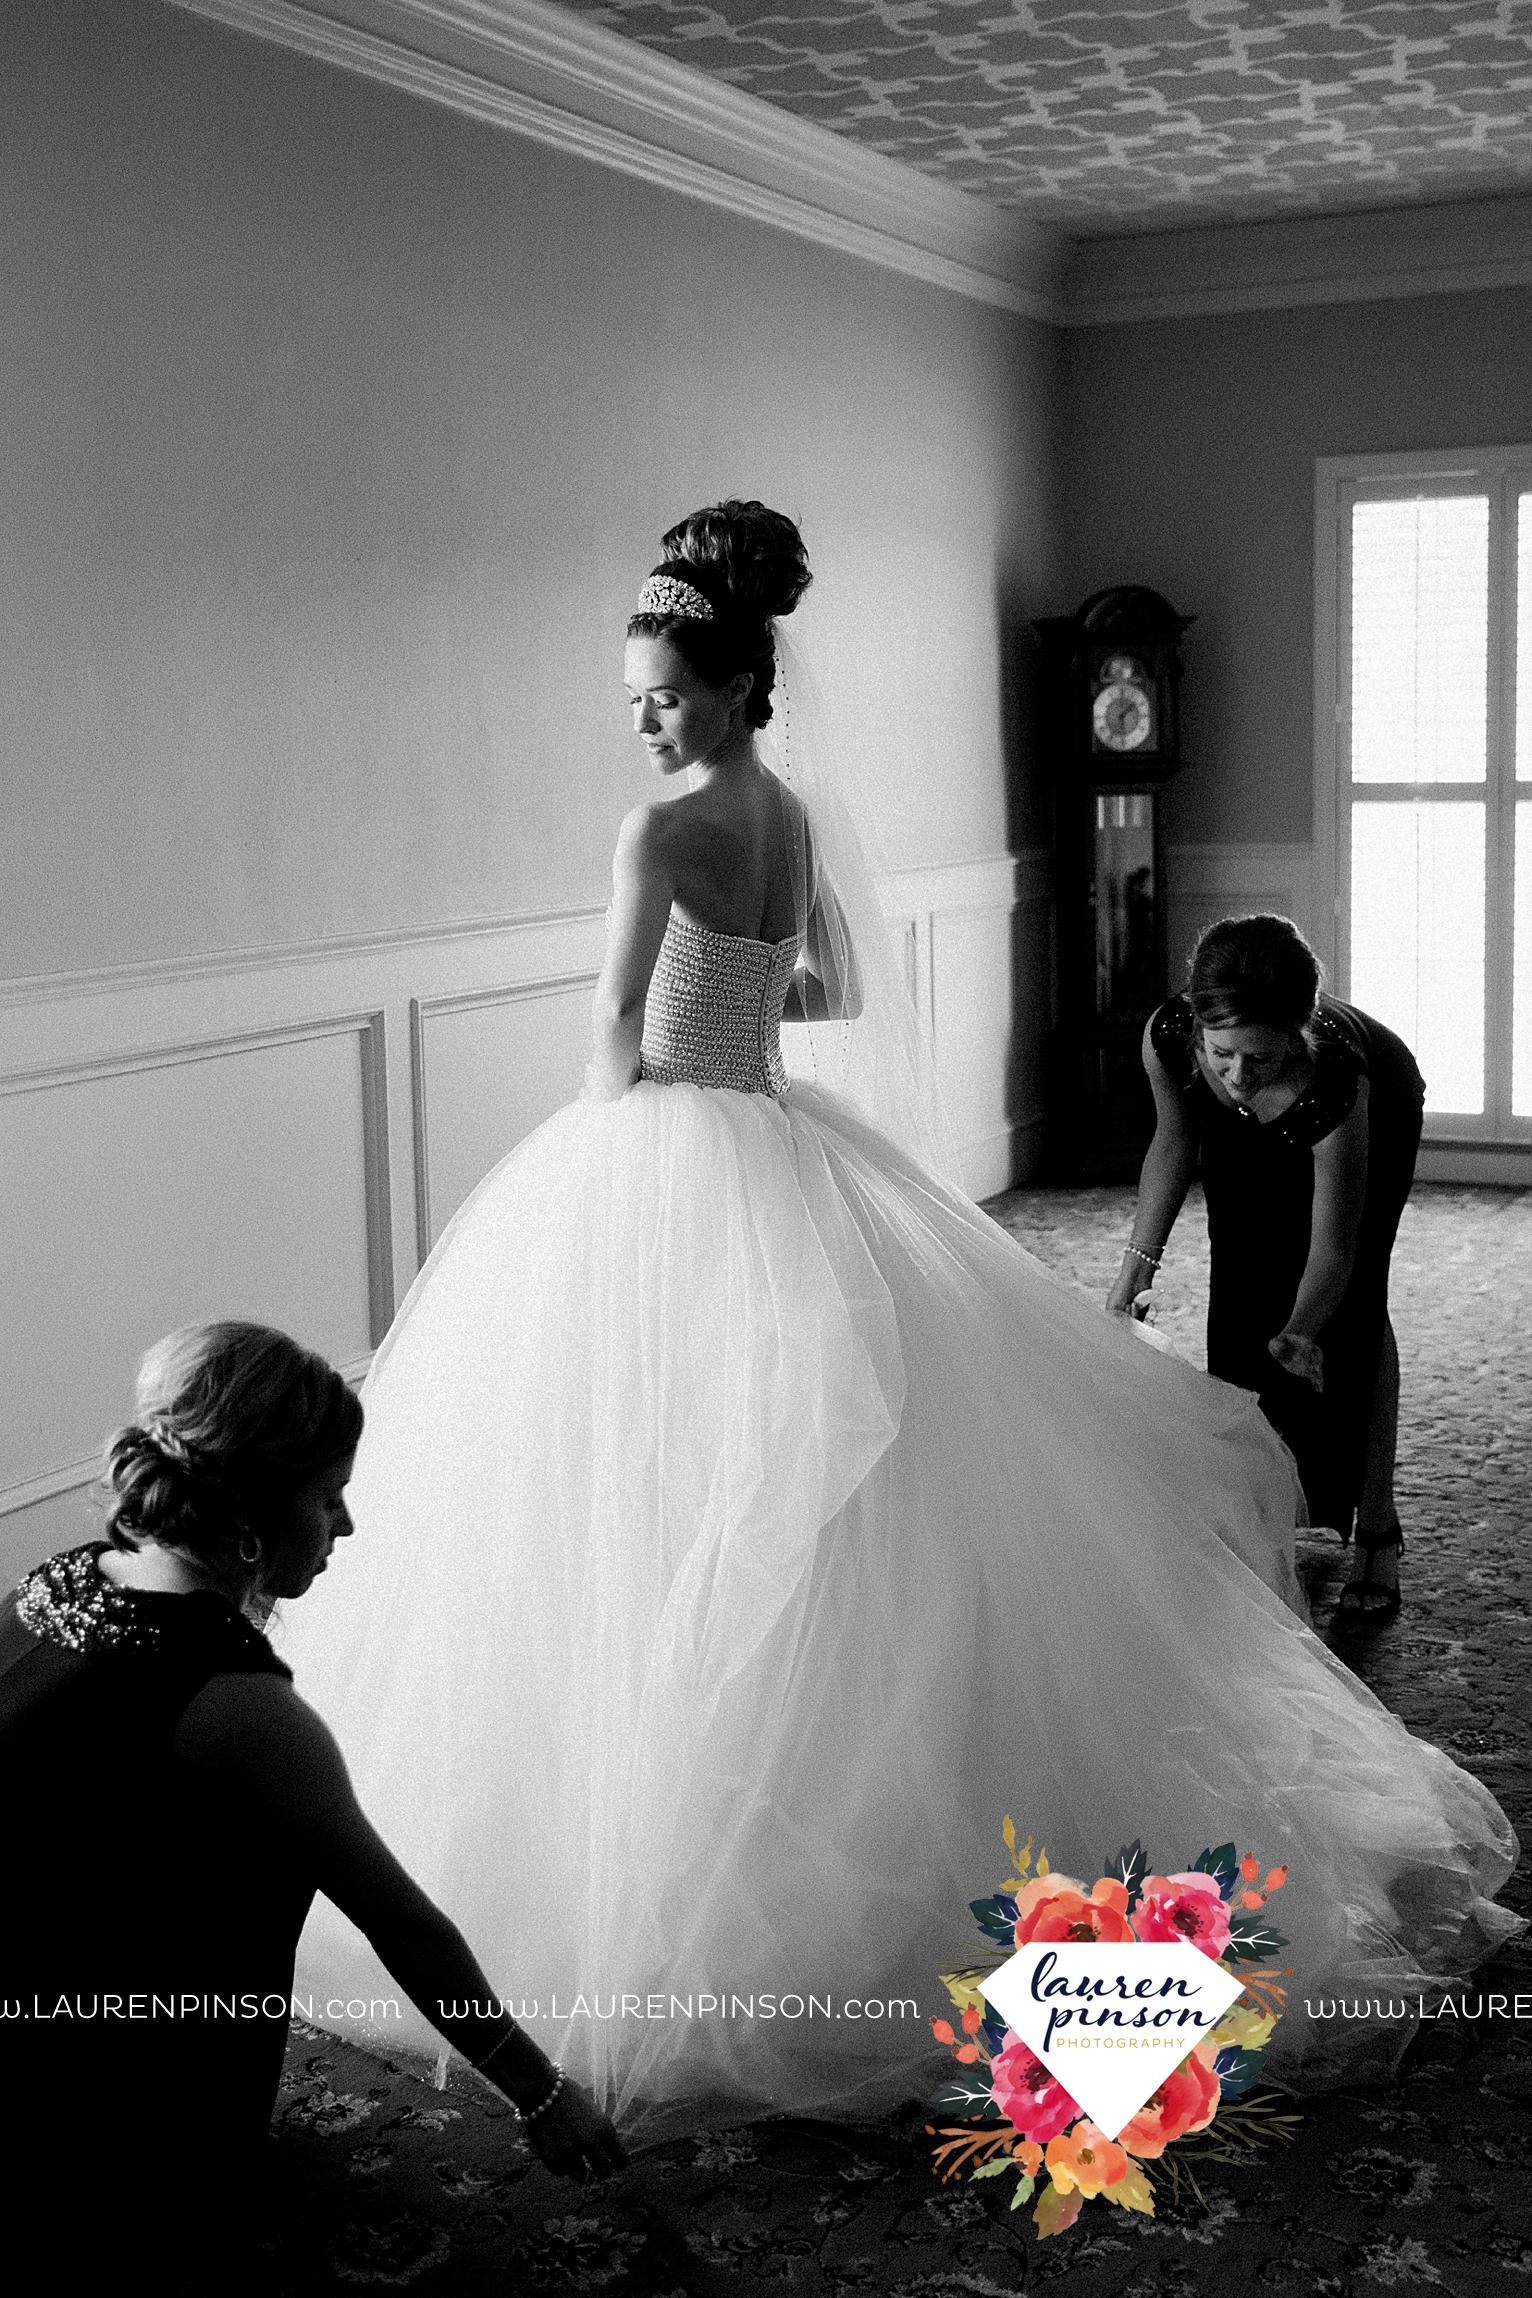 wichita-falls-texas-wedding-photographer-the-forum-by-the-kemp-mayfield-events-ulta-gold-glitter_2813.jpg